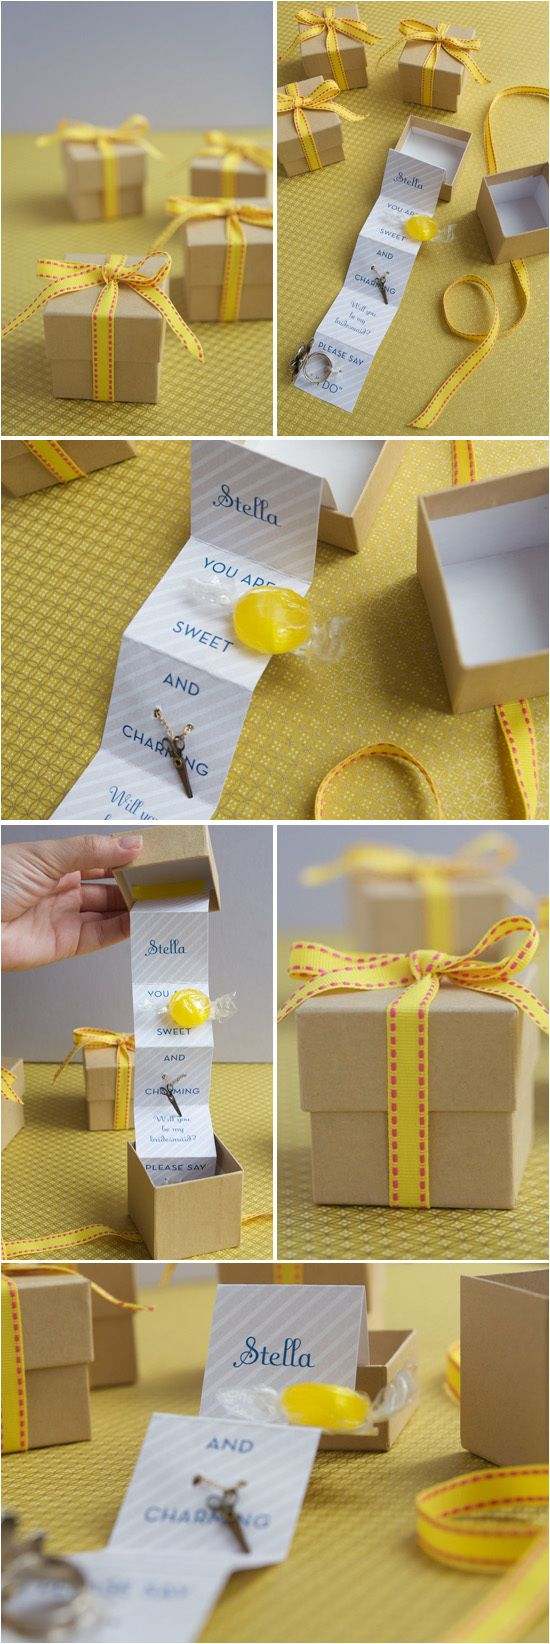 DIY: Bridesmaid Gift Boxes via Project Wedding